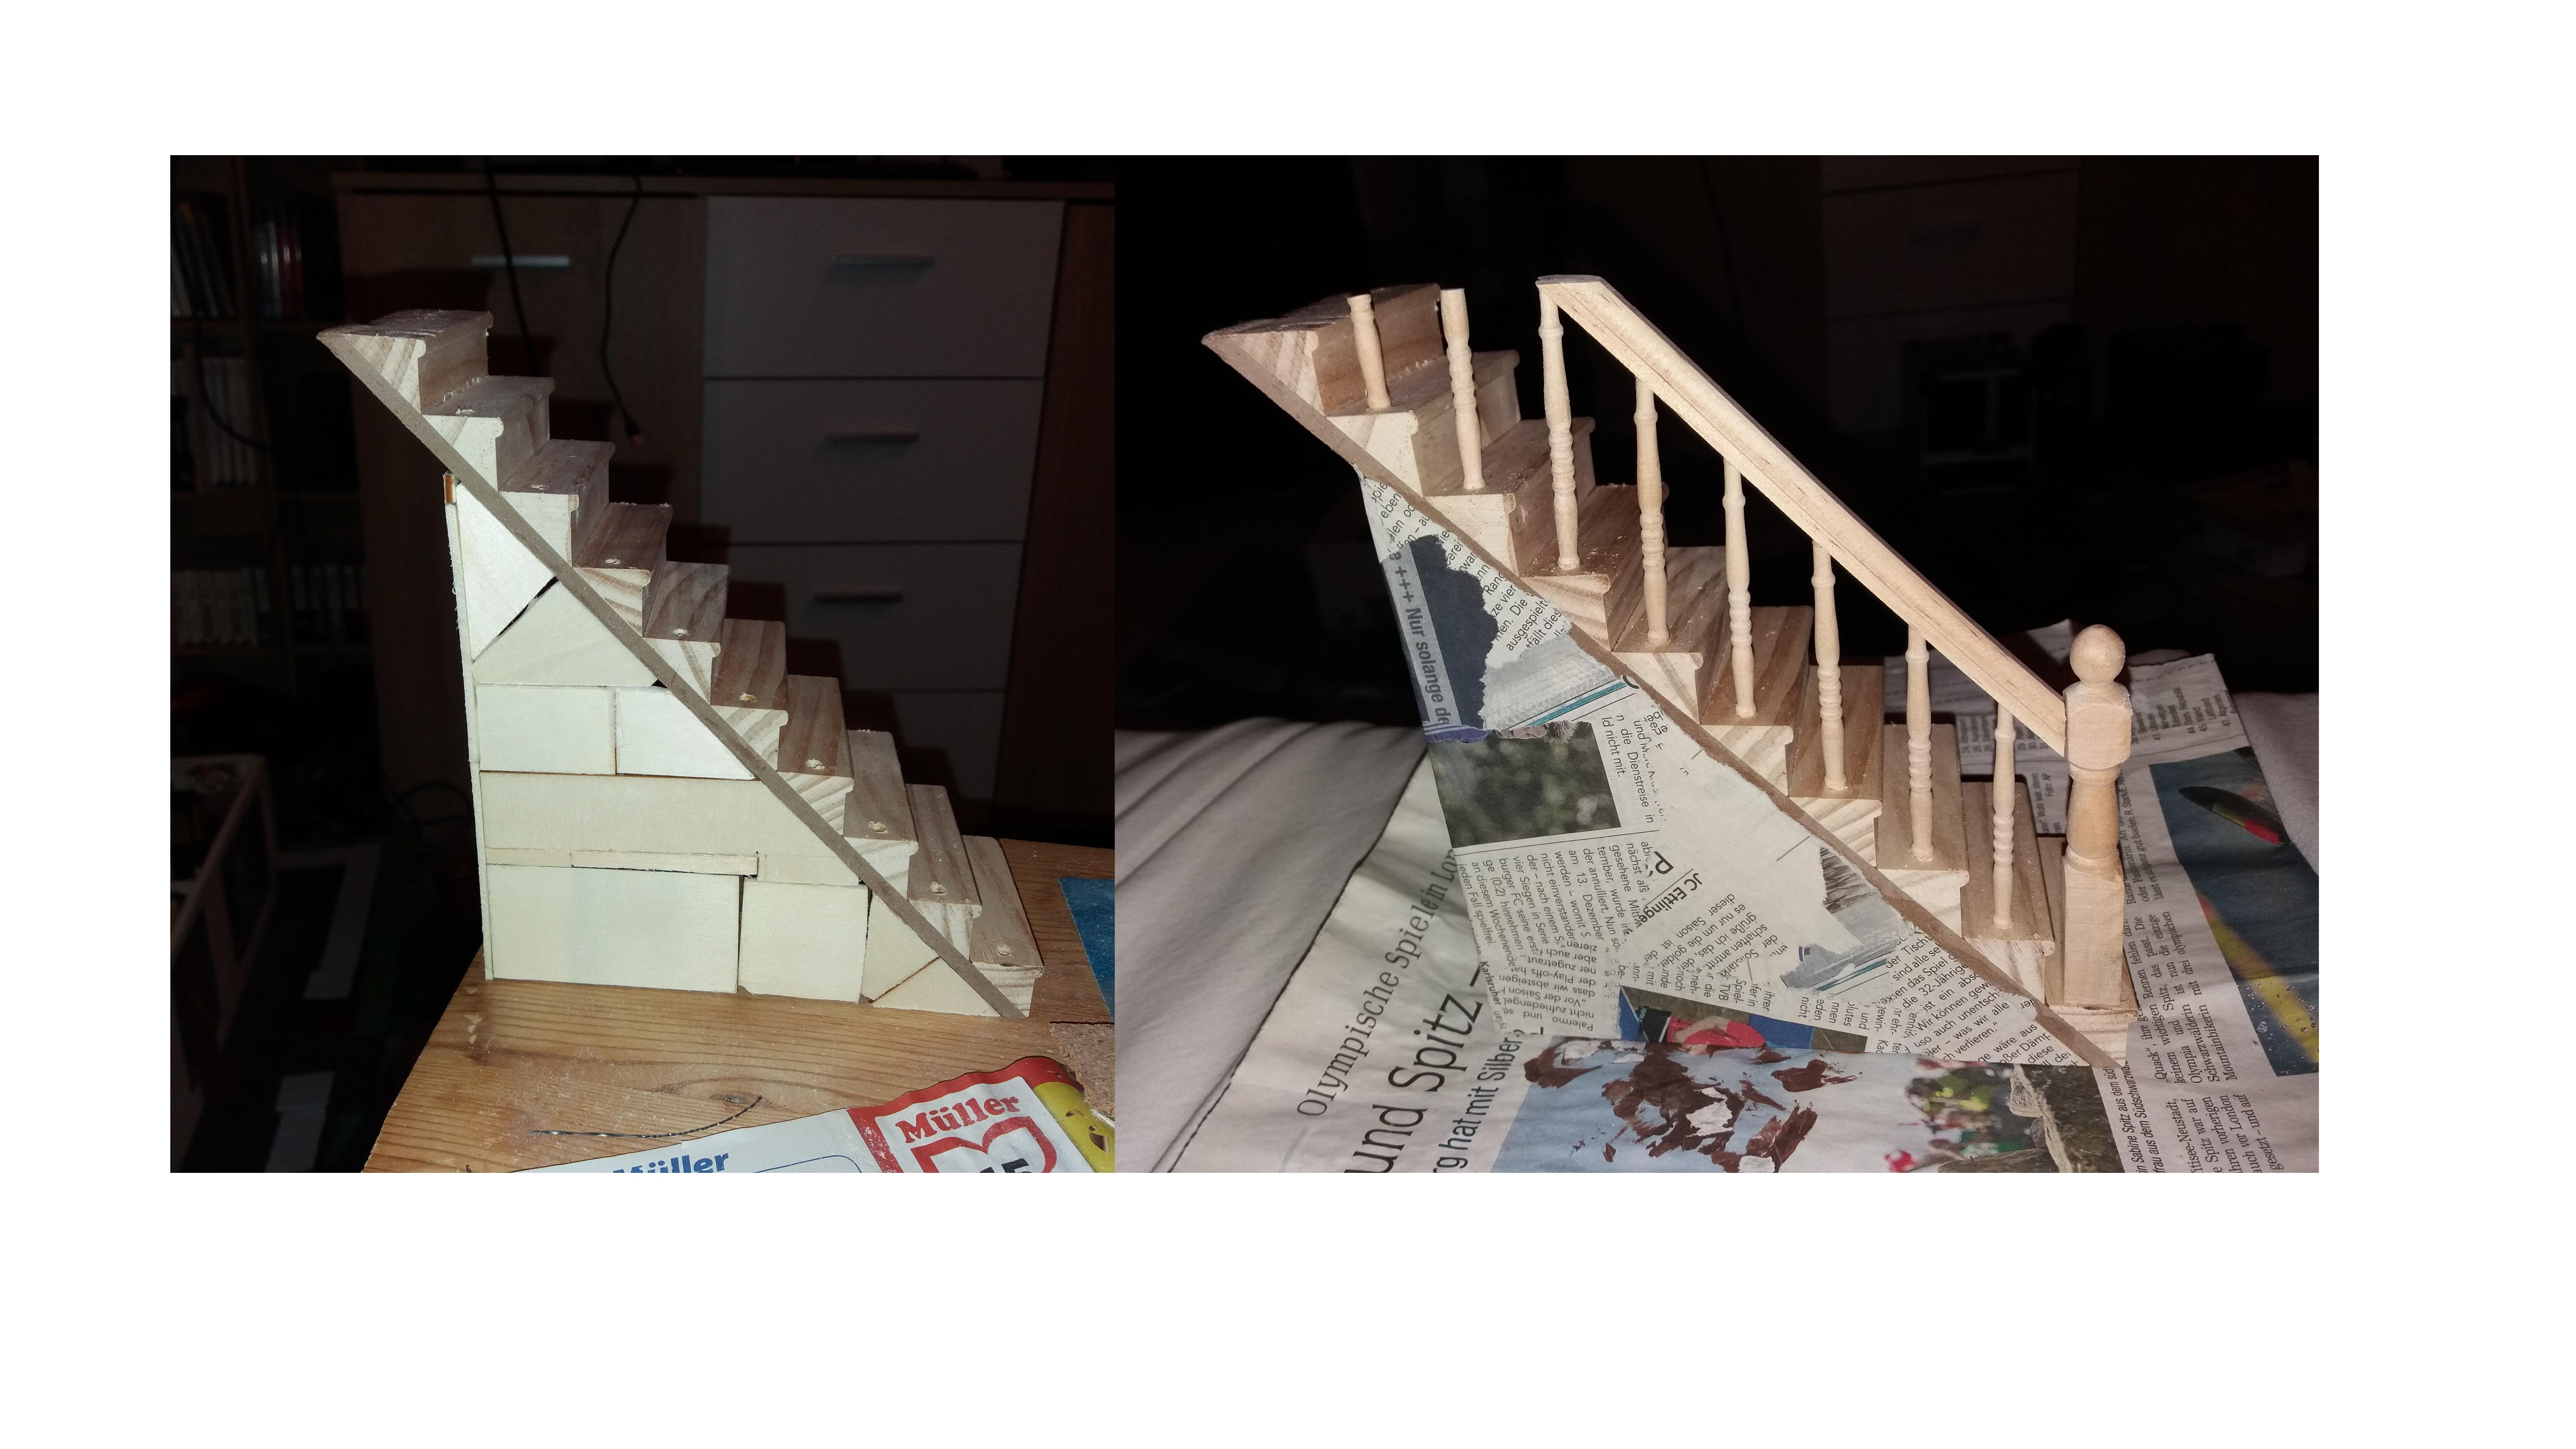 Puppenhaustreppe selber bauen - kombinieren Sie verschiedene Materialien.